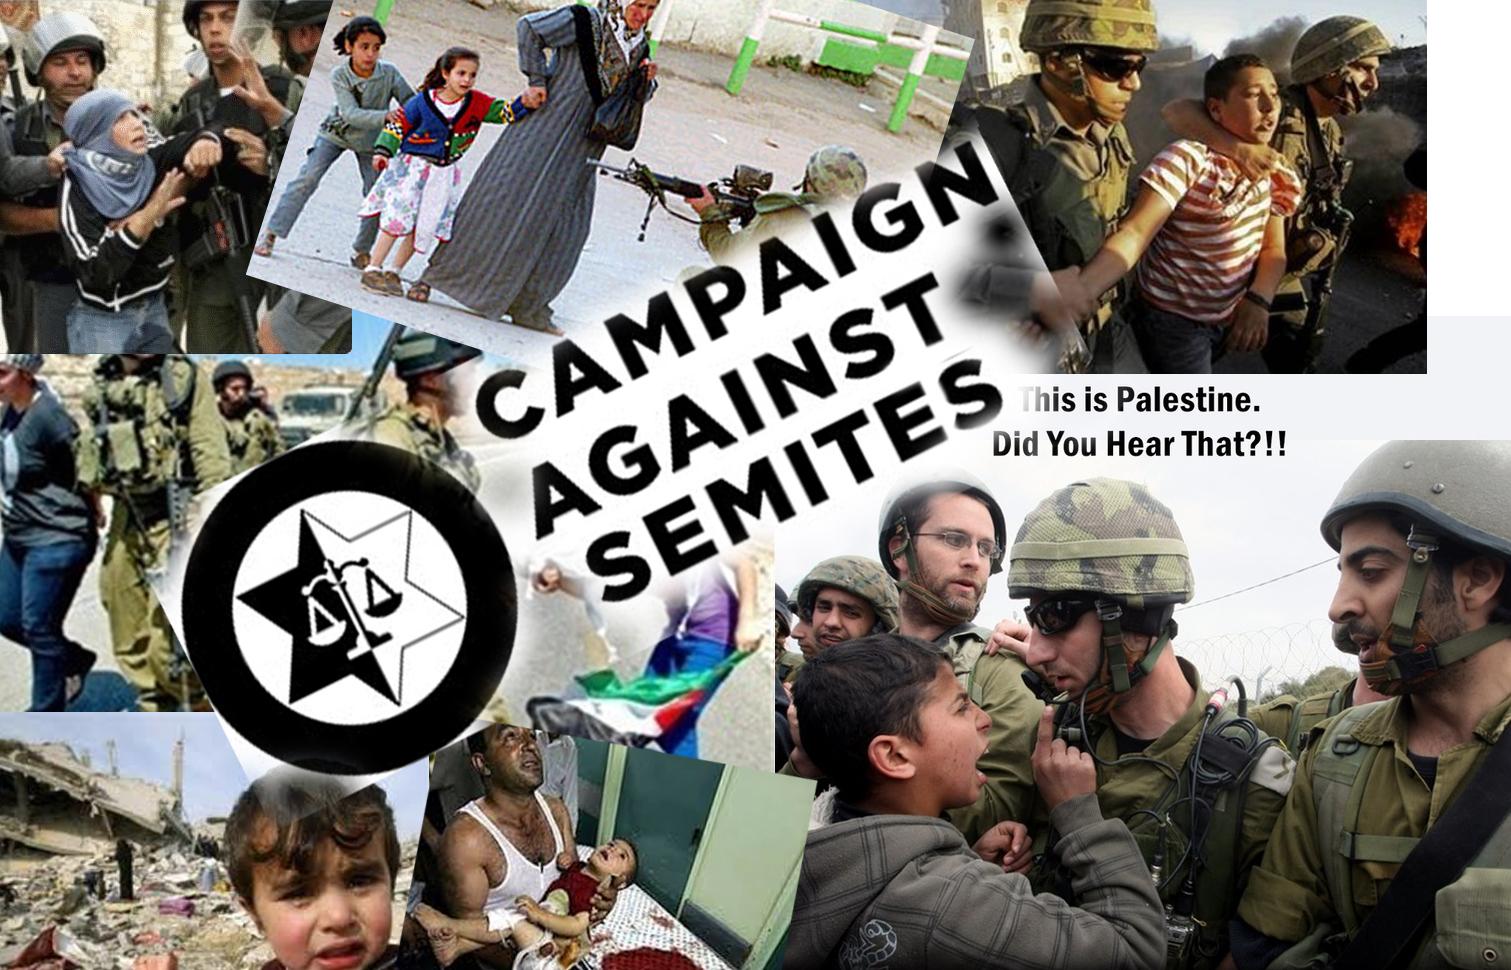 campaign against semites_edited-1.jpg